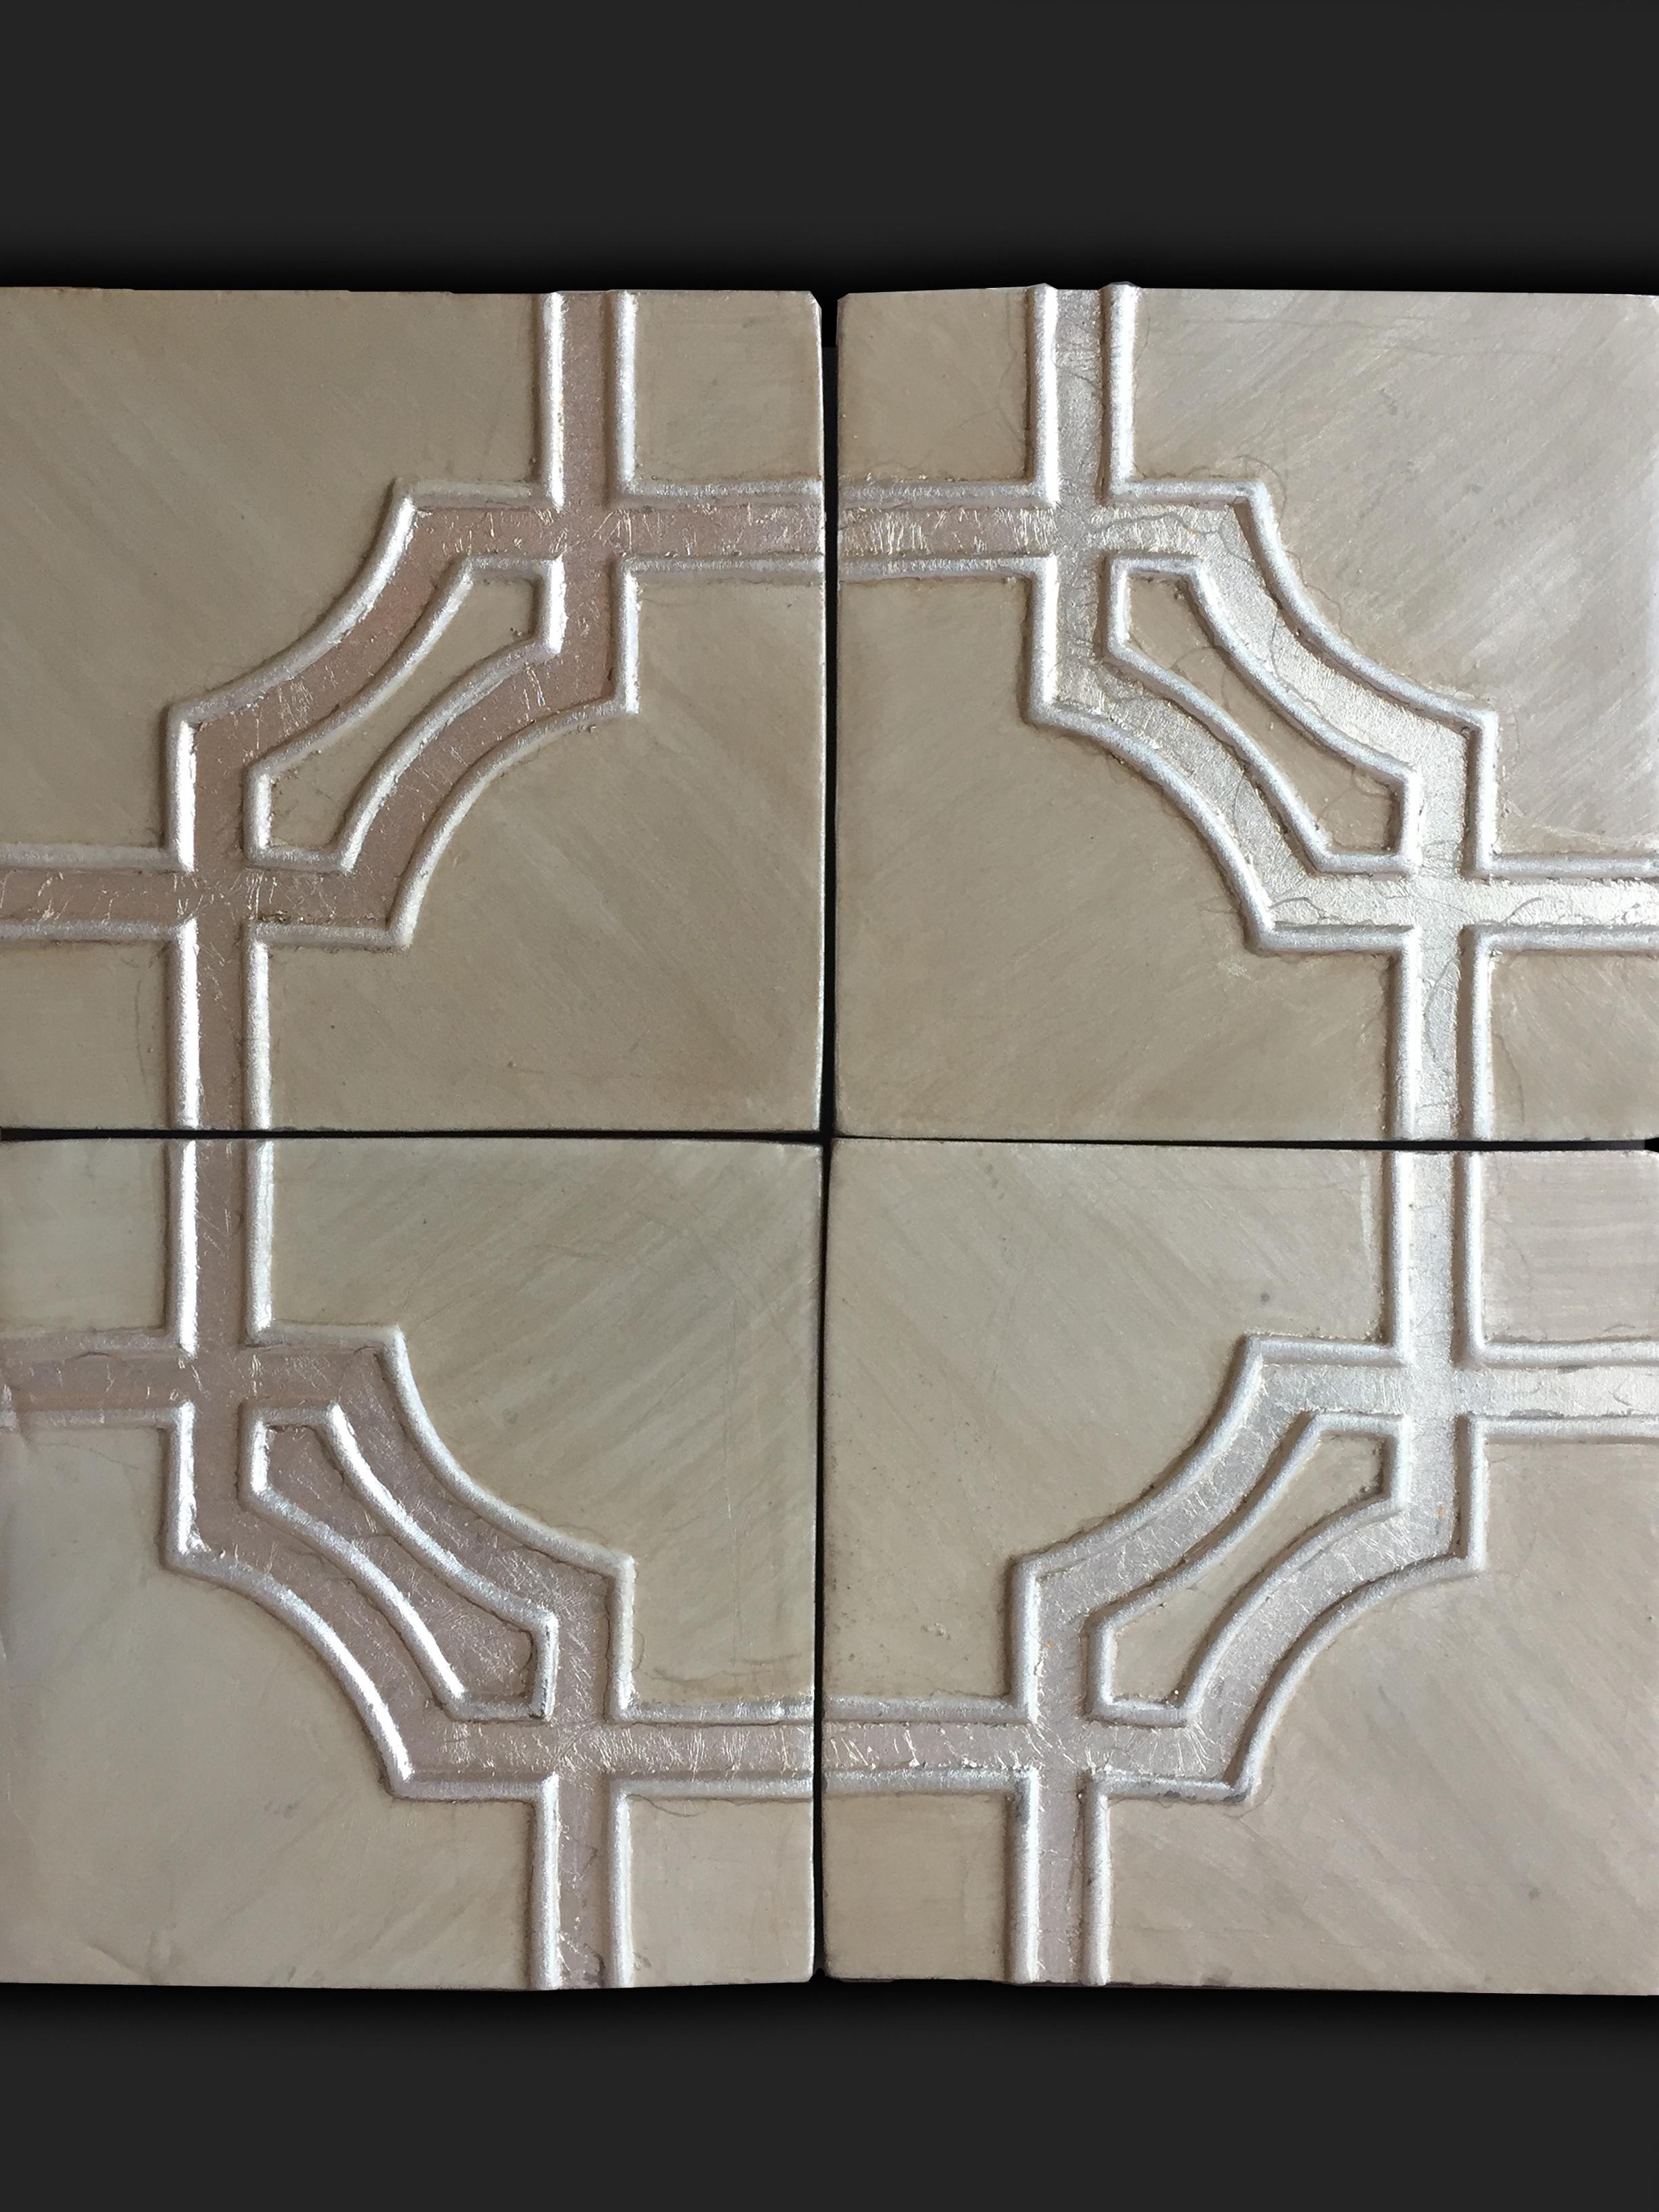 Gold lace patterned tile.